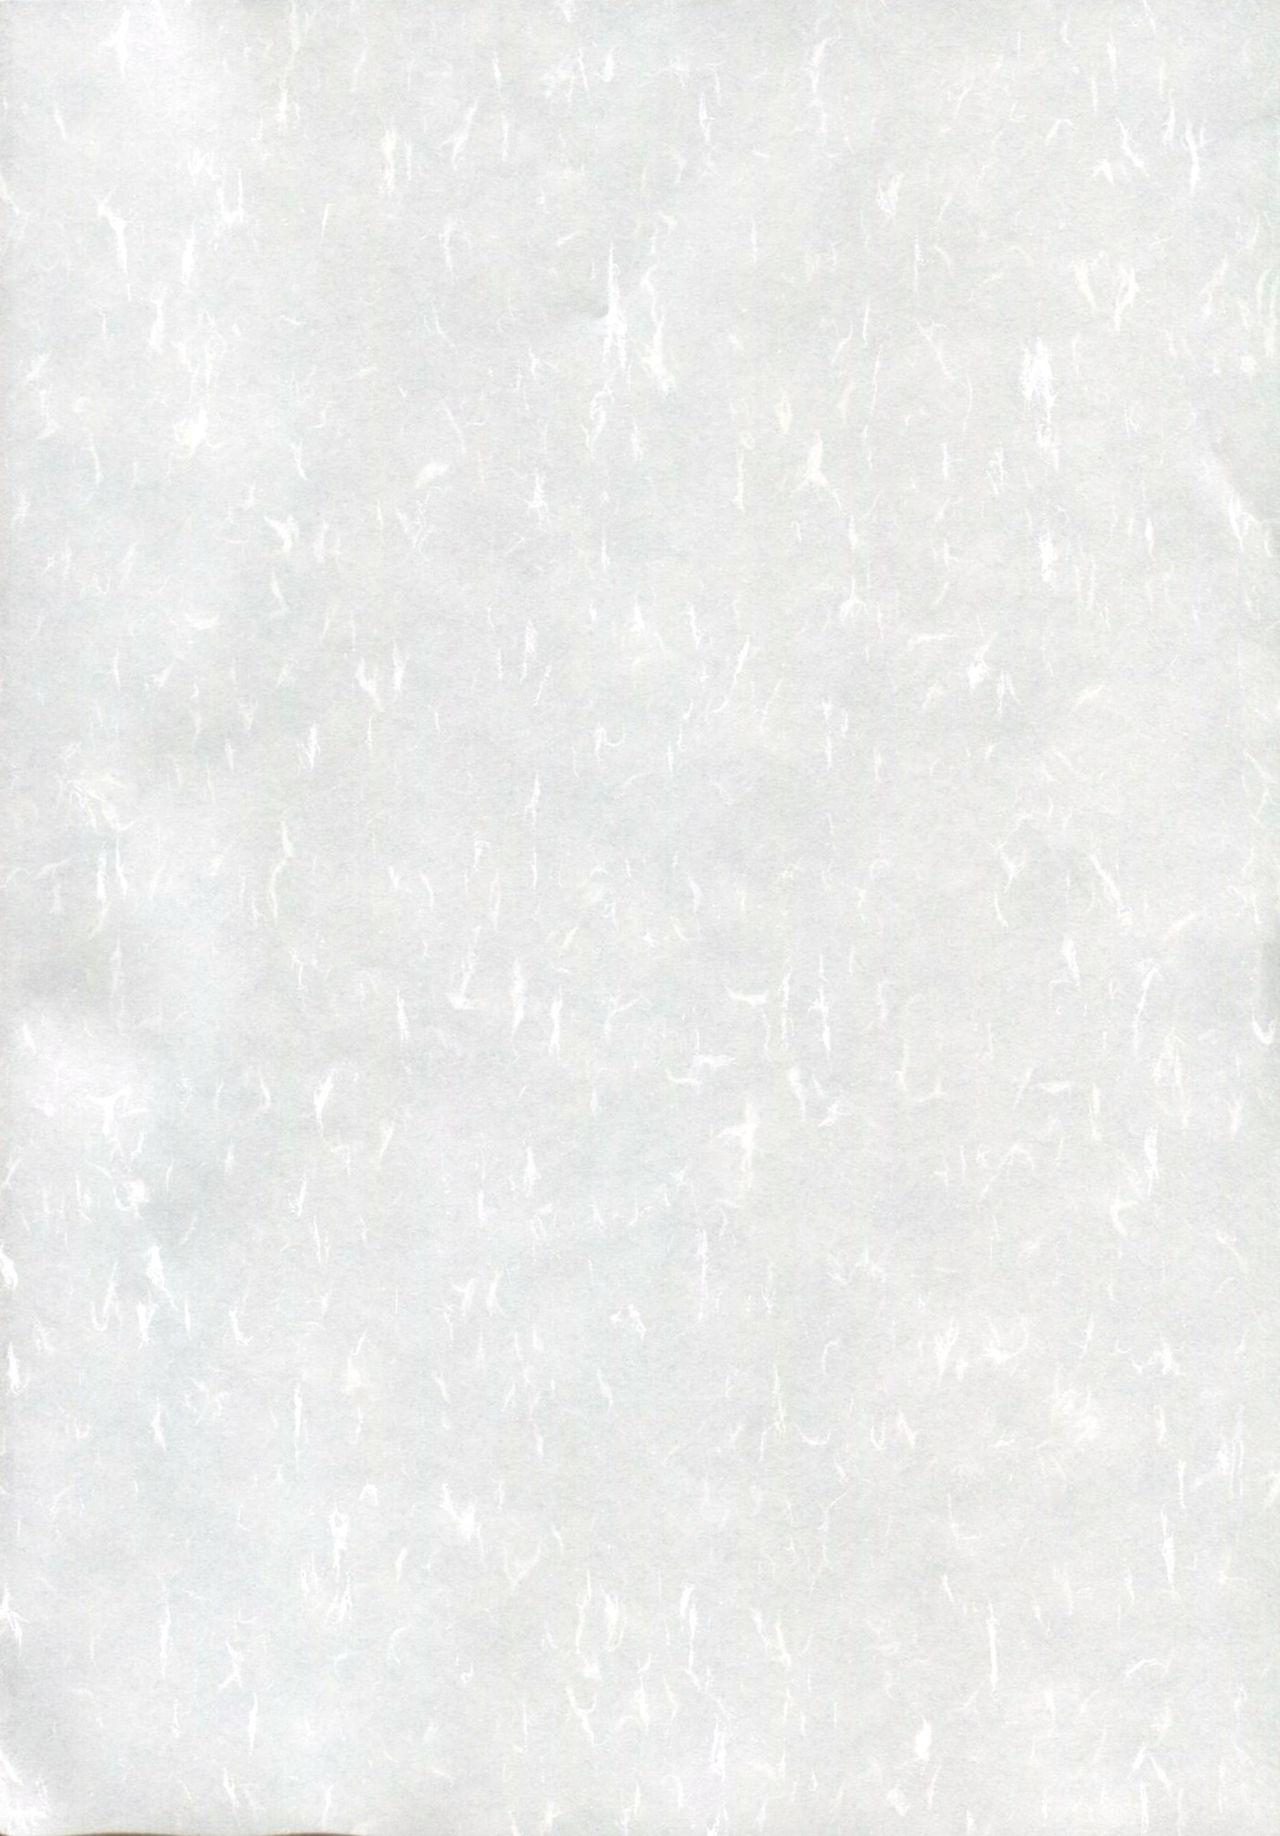 Chichi Zokusei Kanojo 2